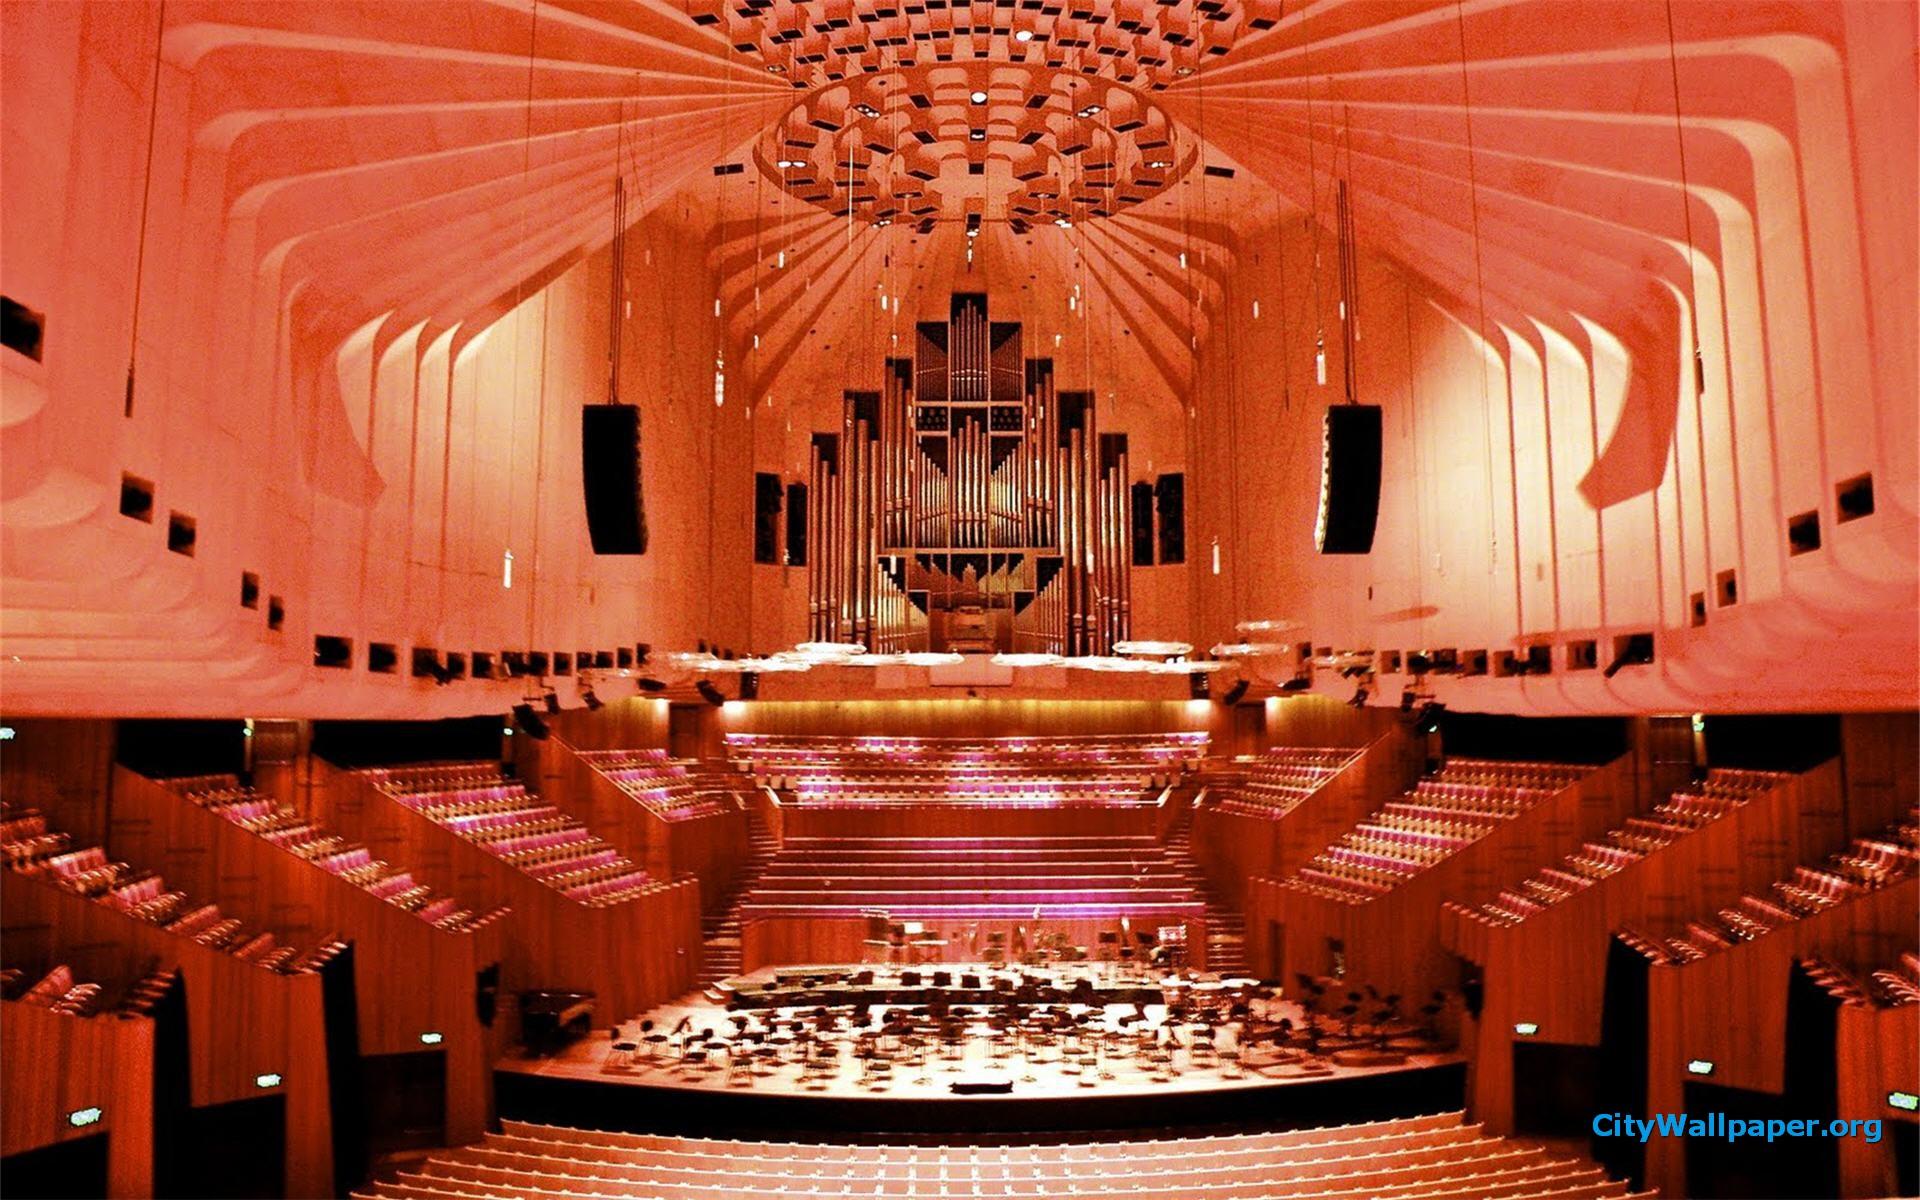 Niagara Falls Full Hd Wallpaper Sydney Opera House The Tourist Destination With The Best